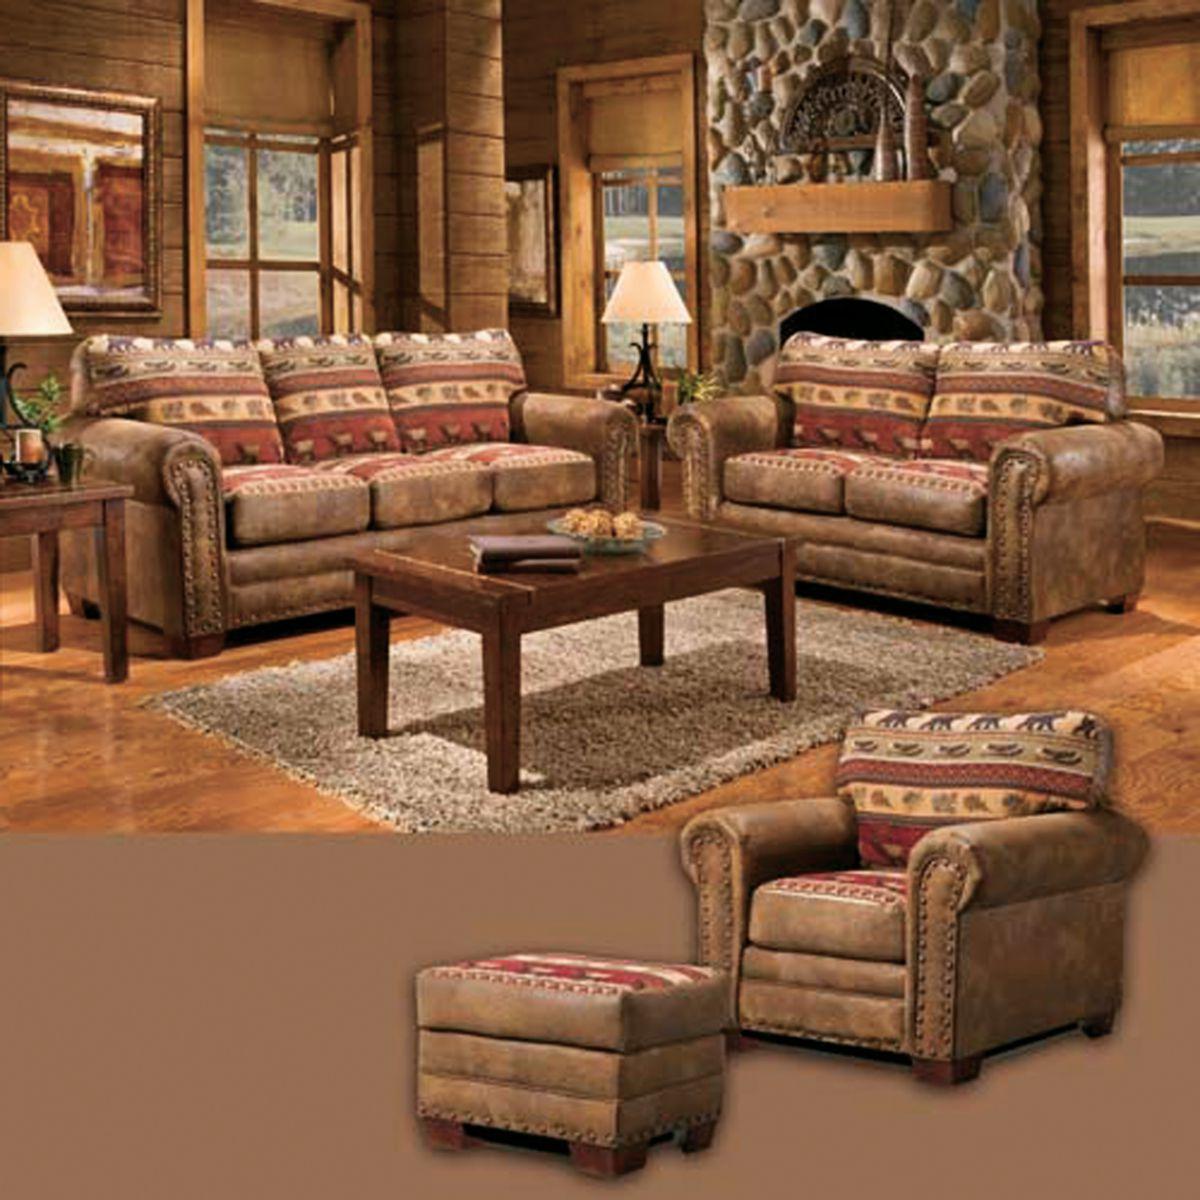 American Furniture Classics Sierra Lodge Four-Piece Set